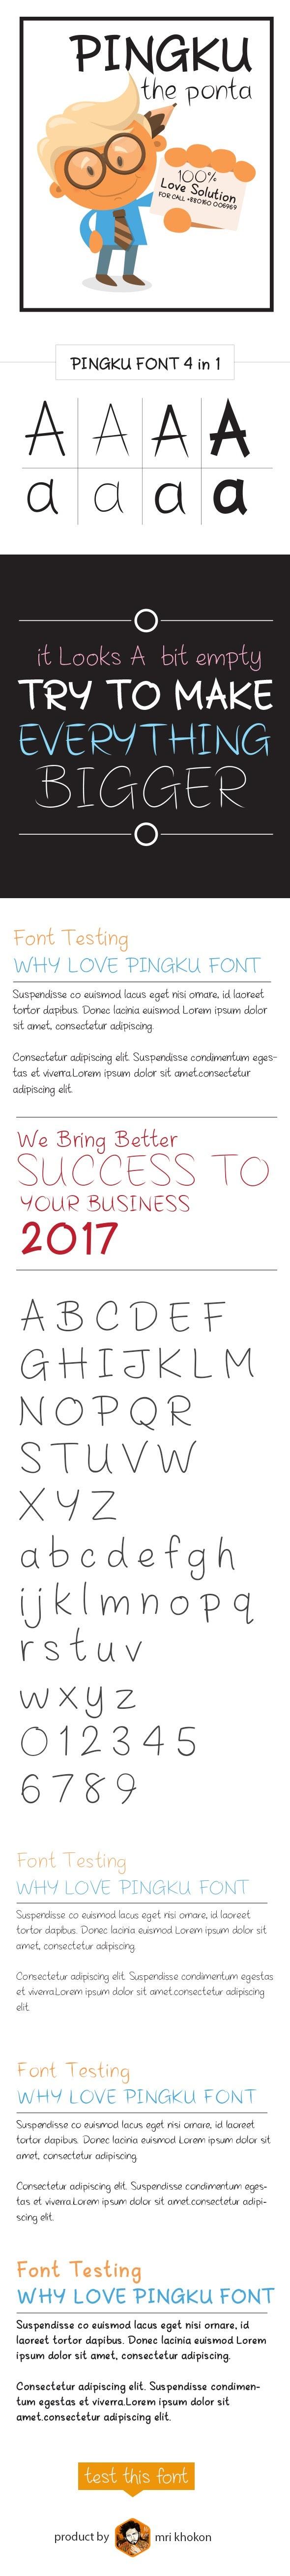 Pingku Font - Handwriting Fonts